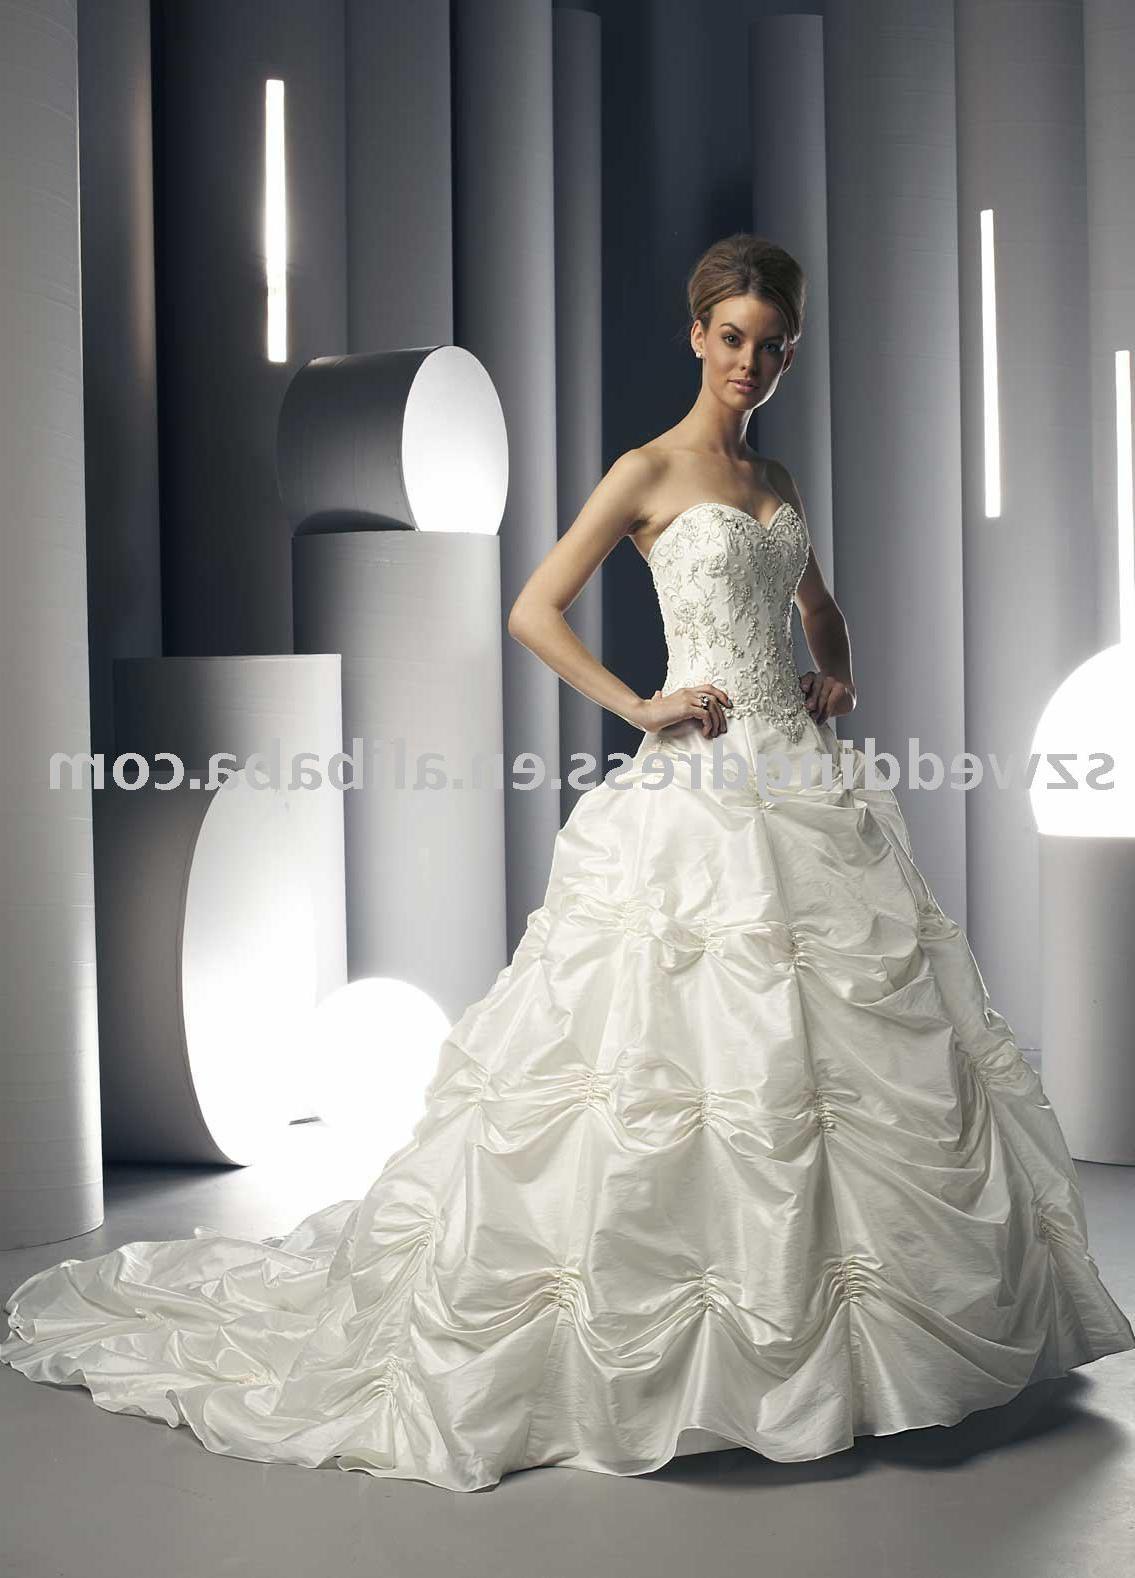 2009 popular wedding dress HS_1080. See larger image: 2009 popular wedding